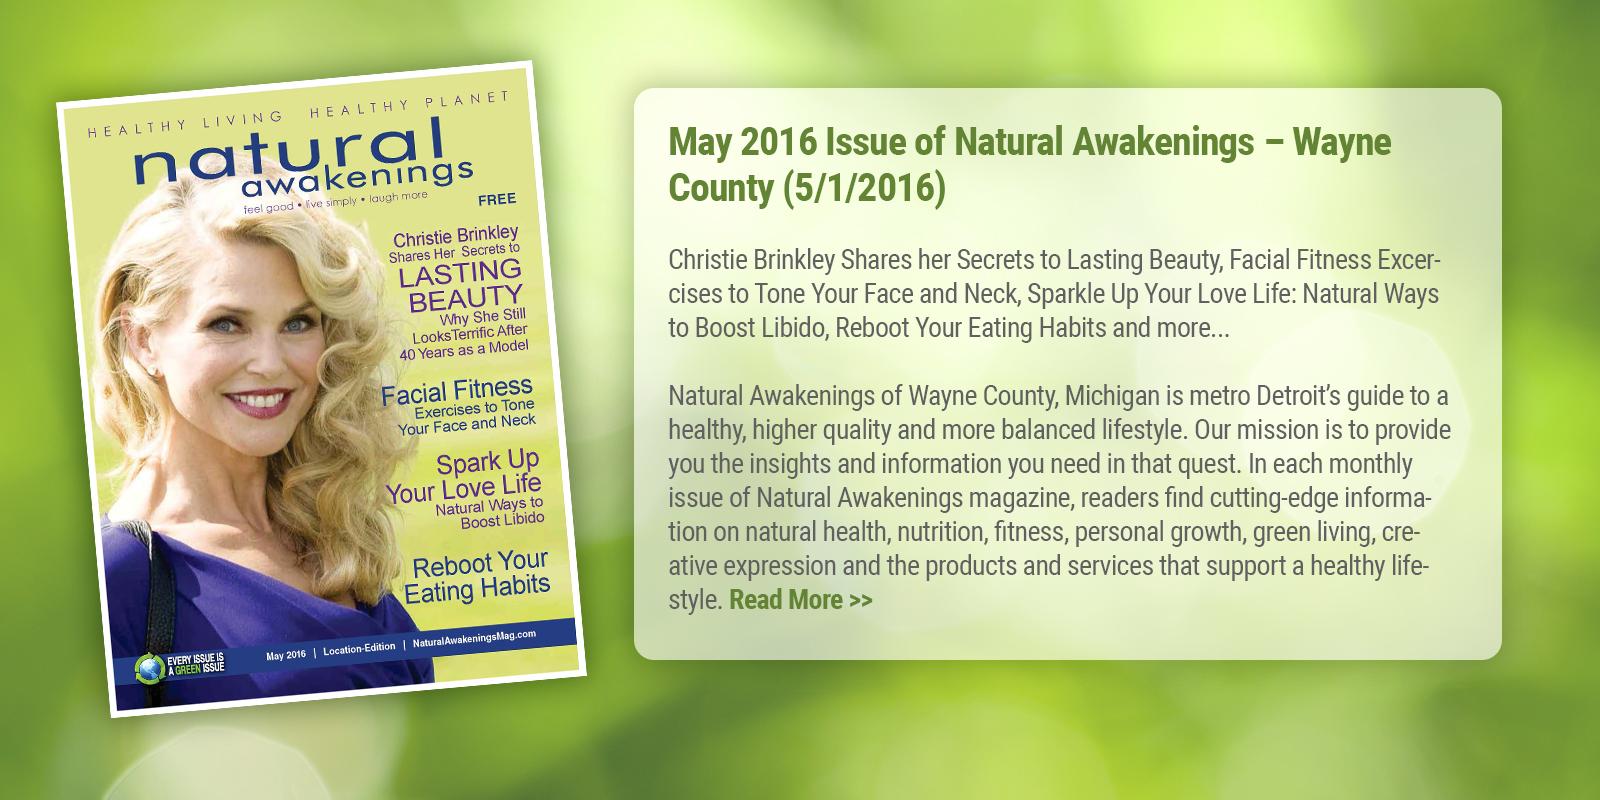 Natural Awakenings of Wayne County, Michigan